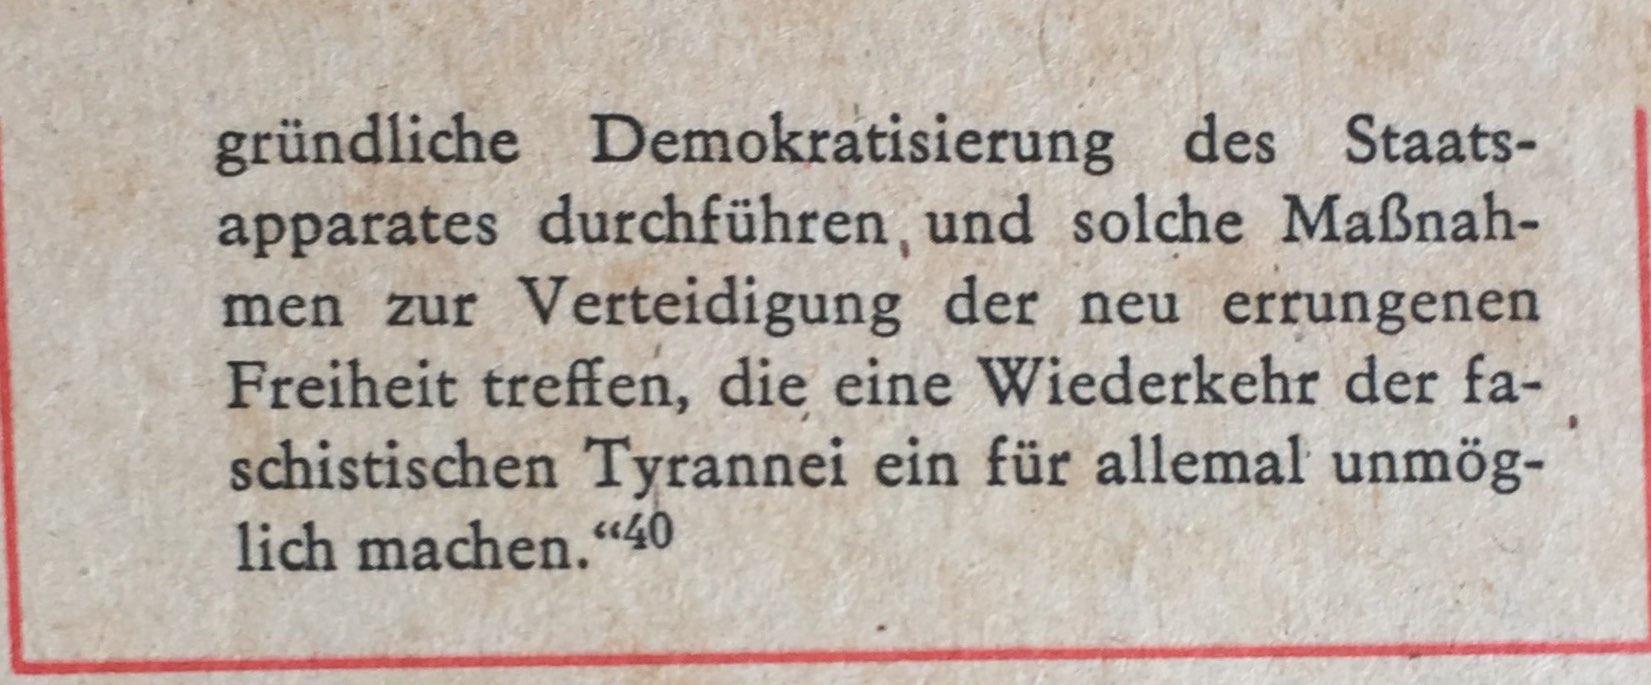 Berner Resolution Programm demokratische Republik 2